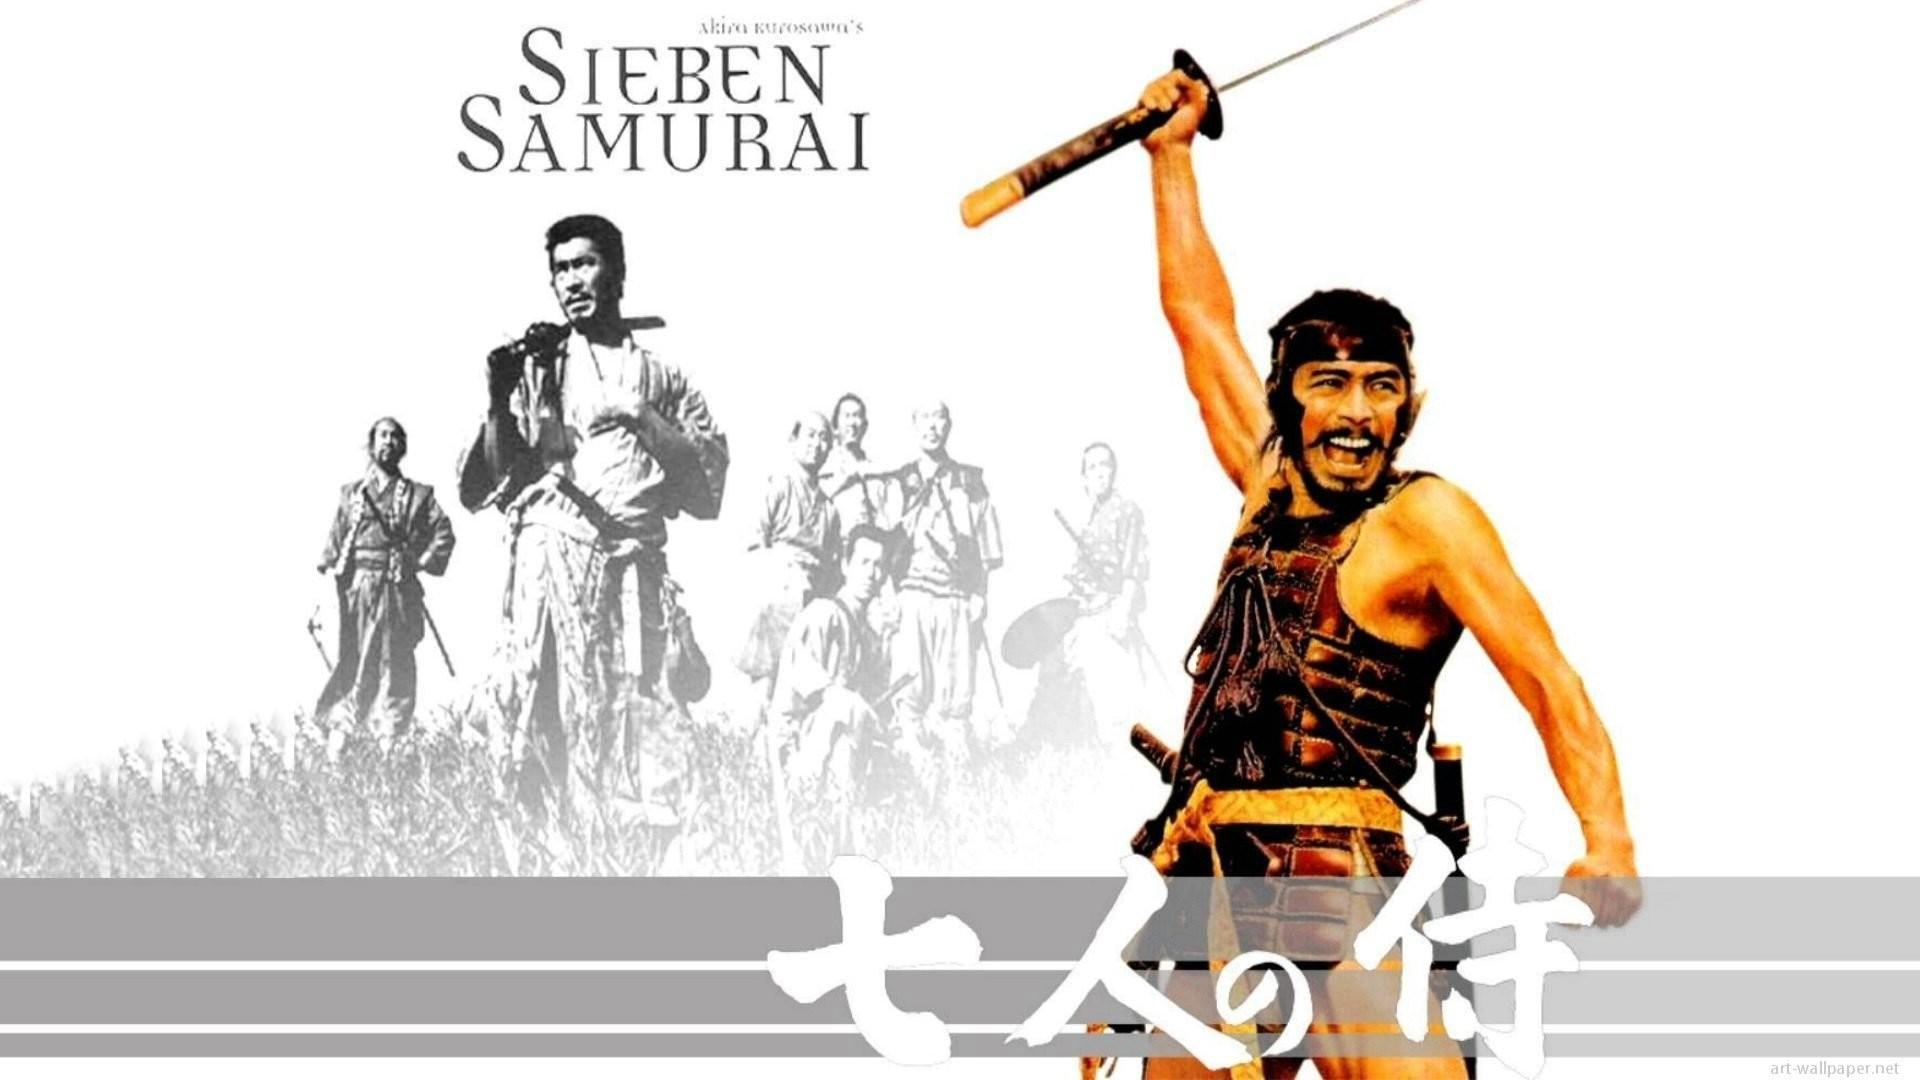 Seven Samurai 325241 · seven 243396